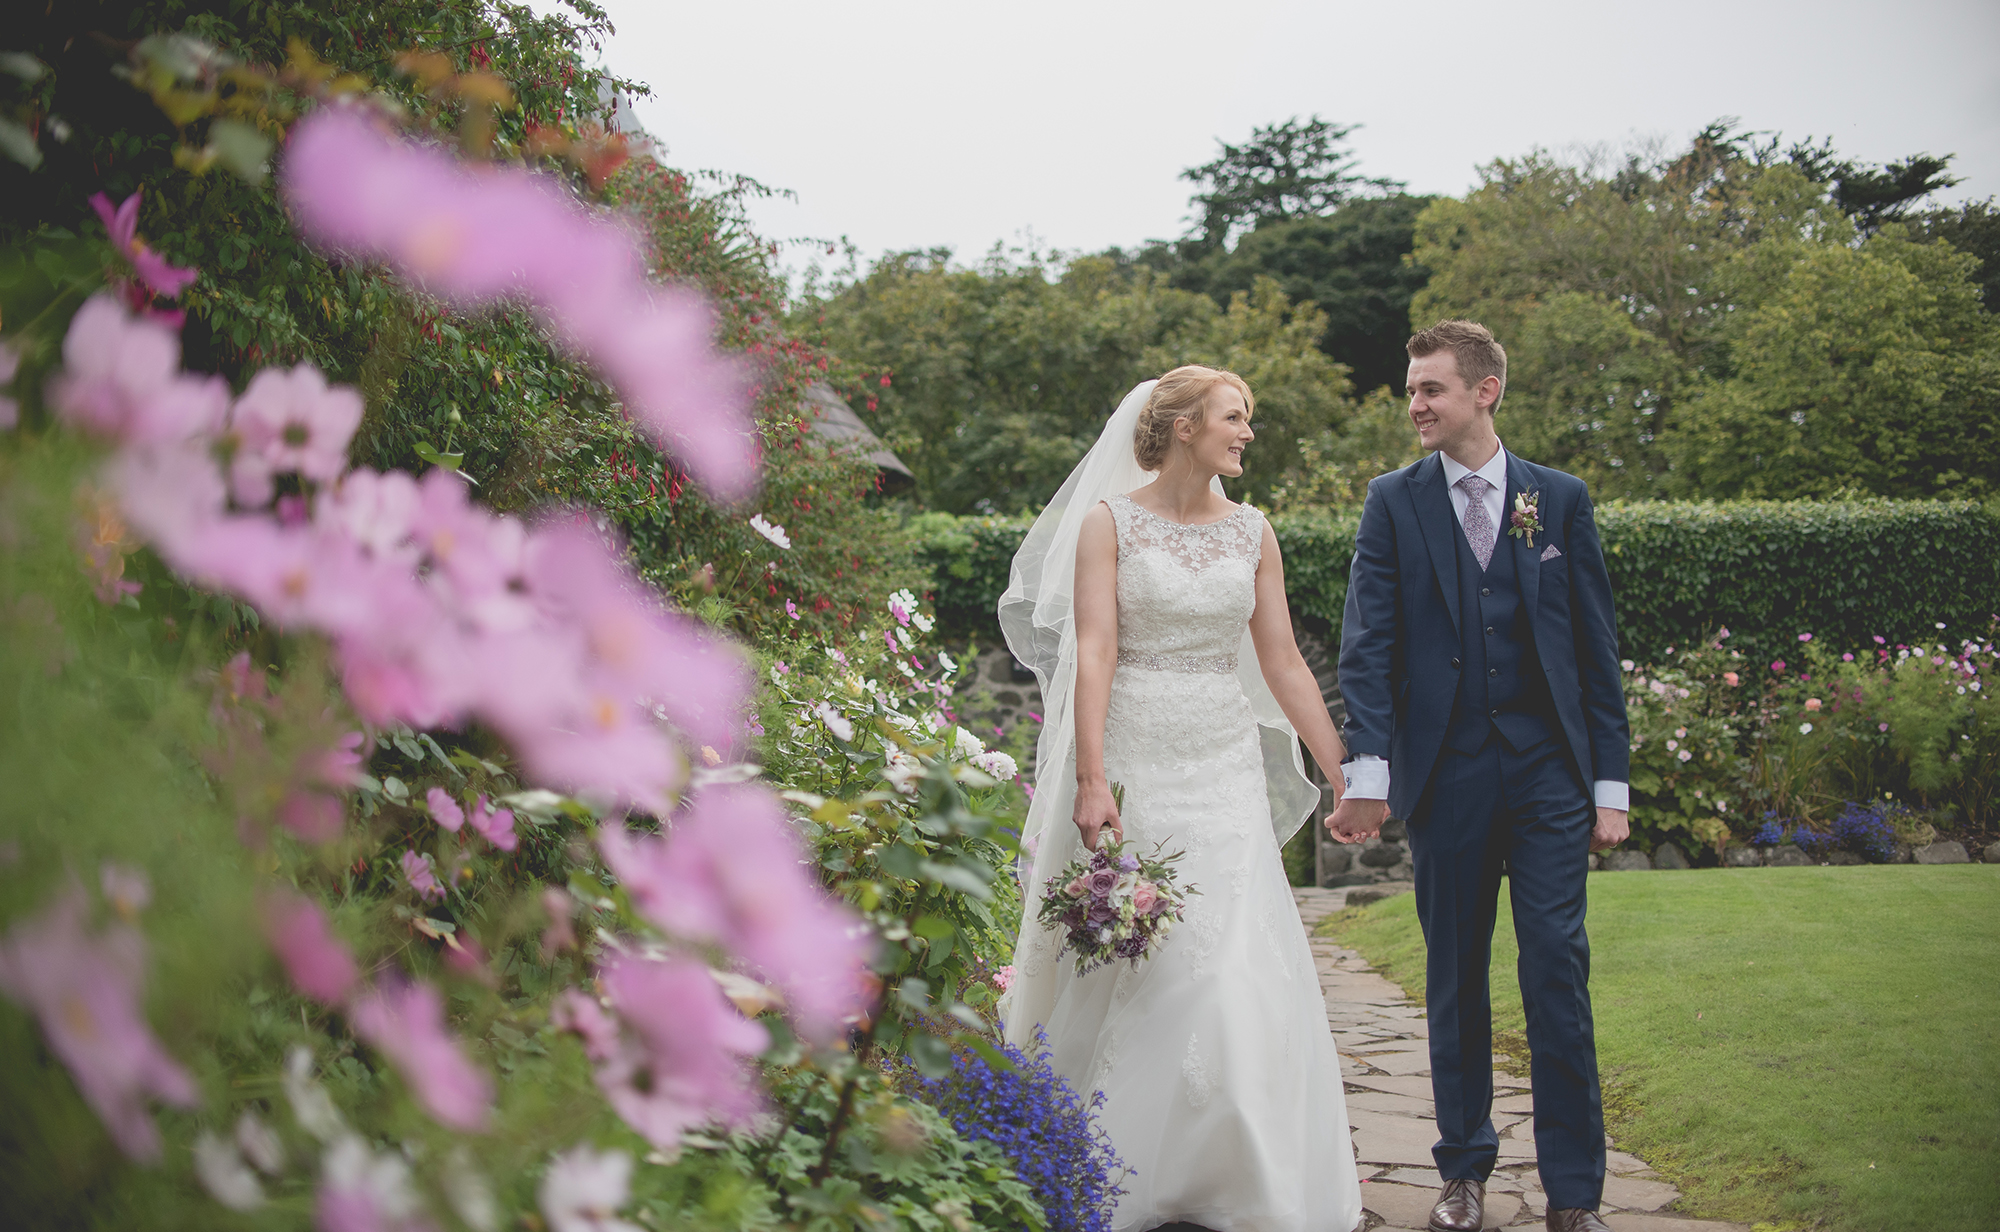 ballygally wedding photography tc photography larne belfast lisburn 16